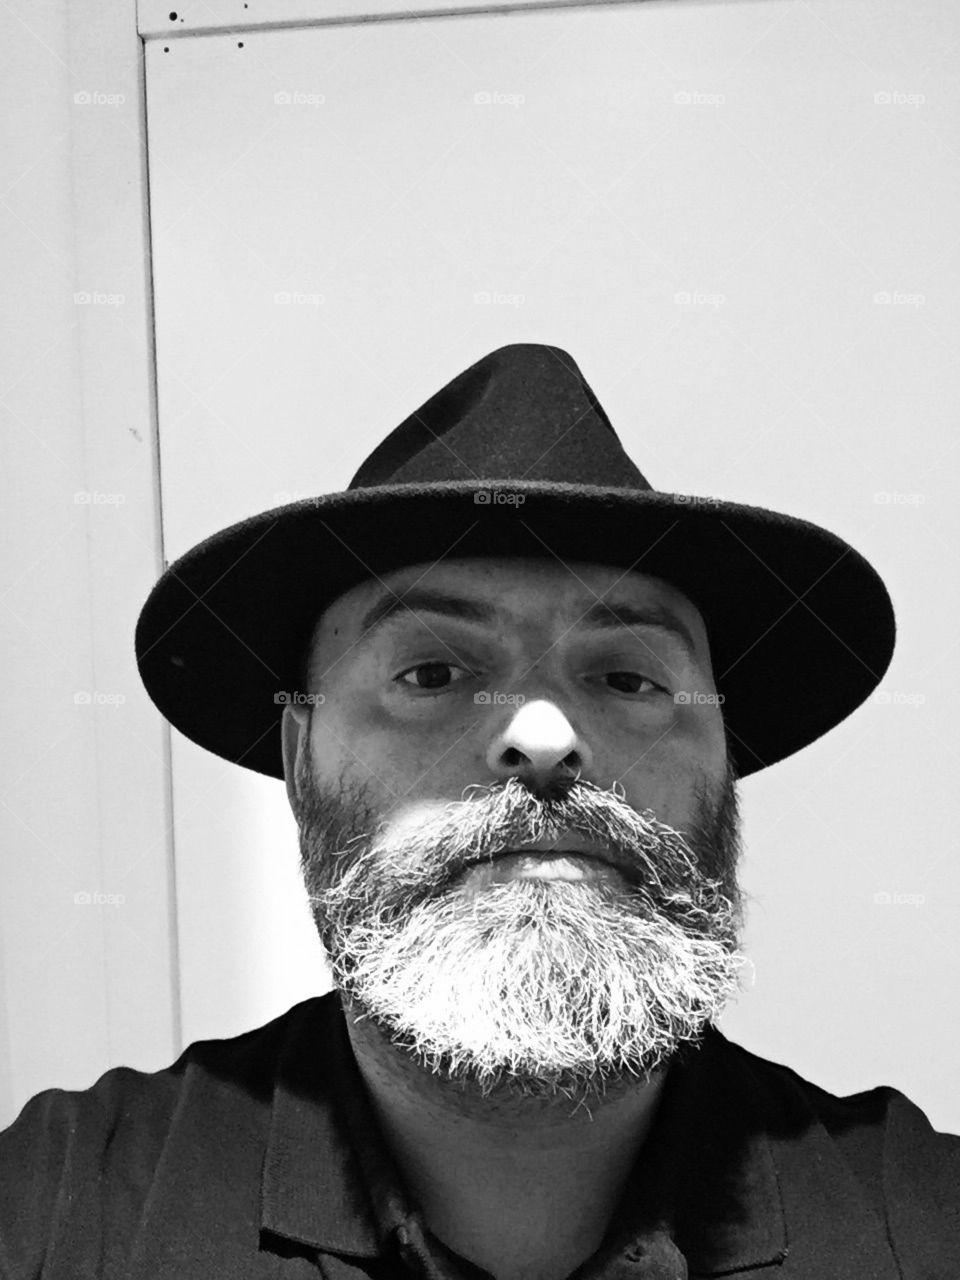 Man with beard wearing hat